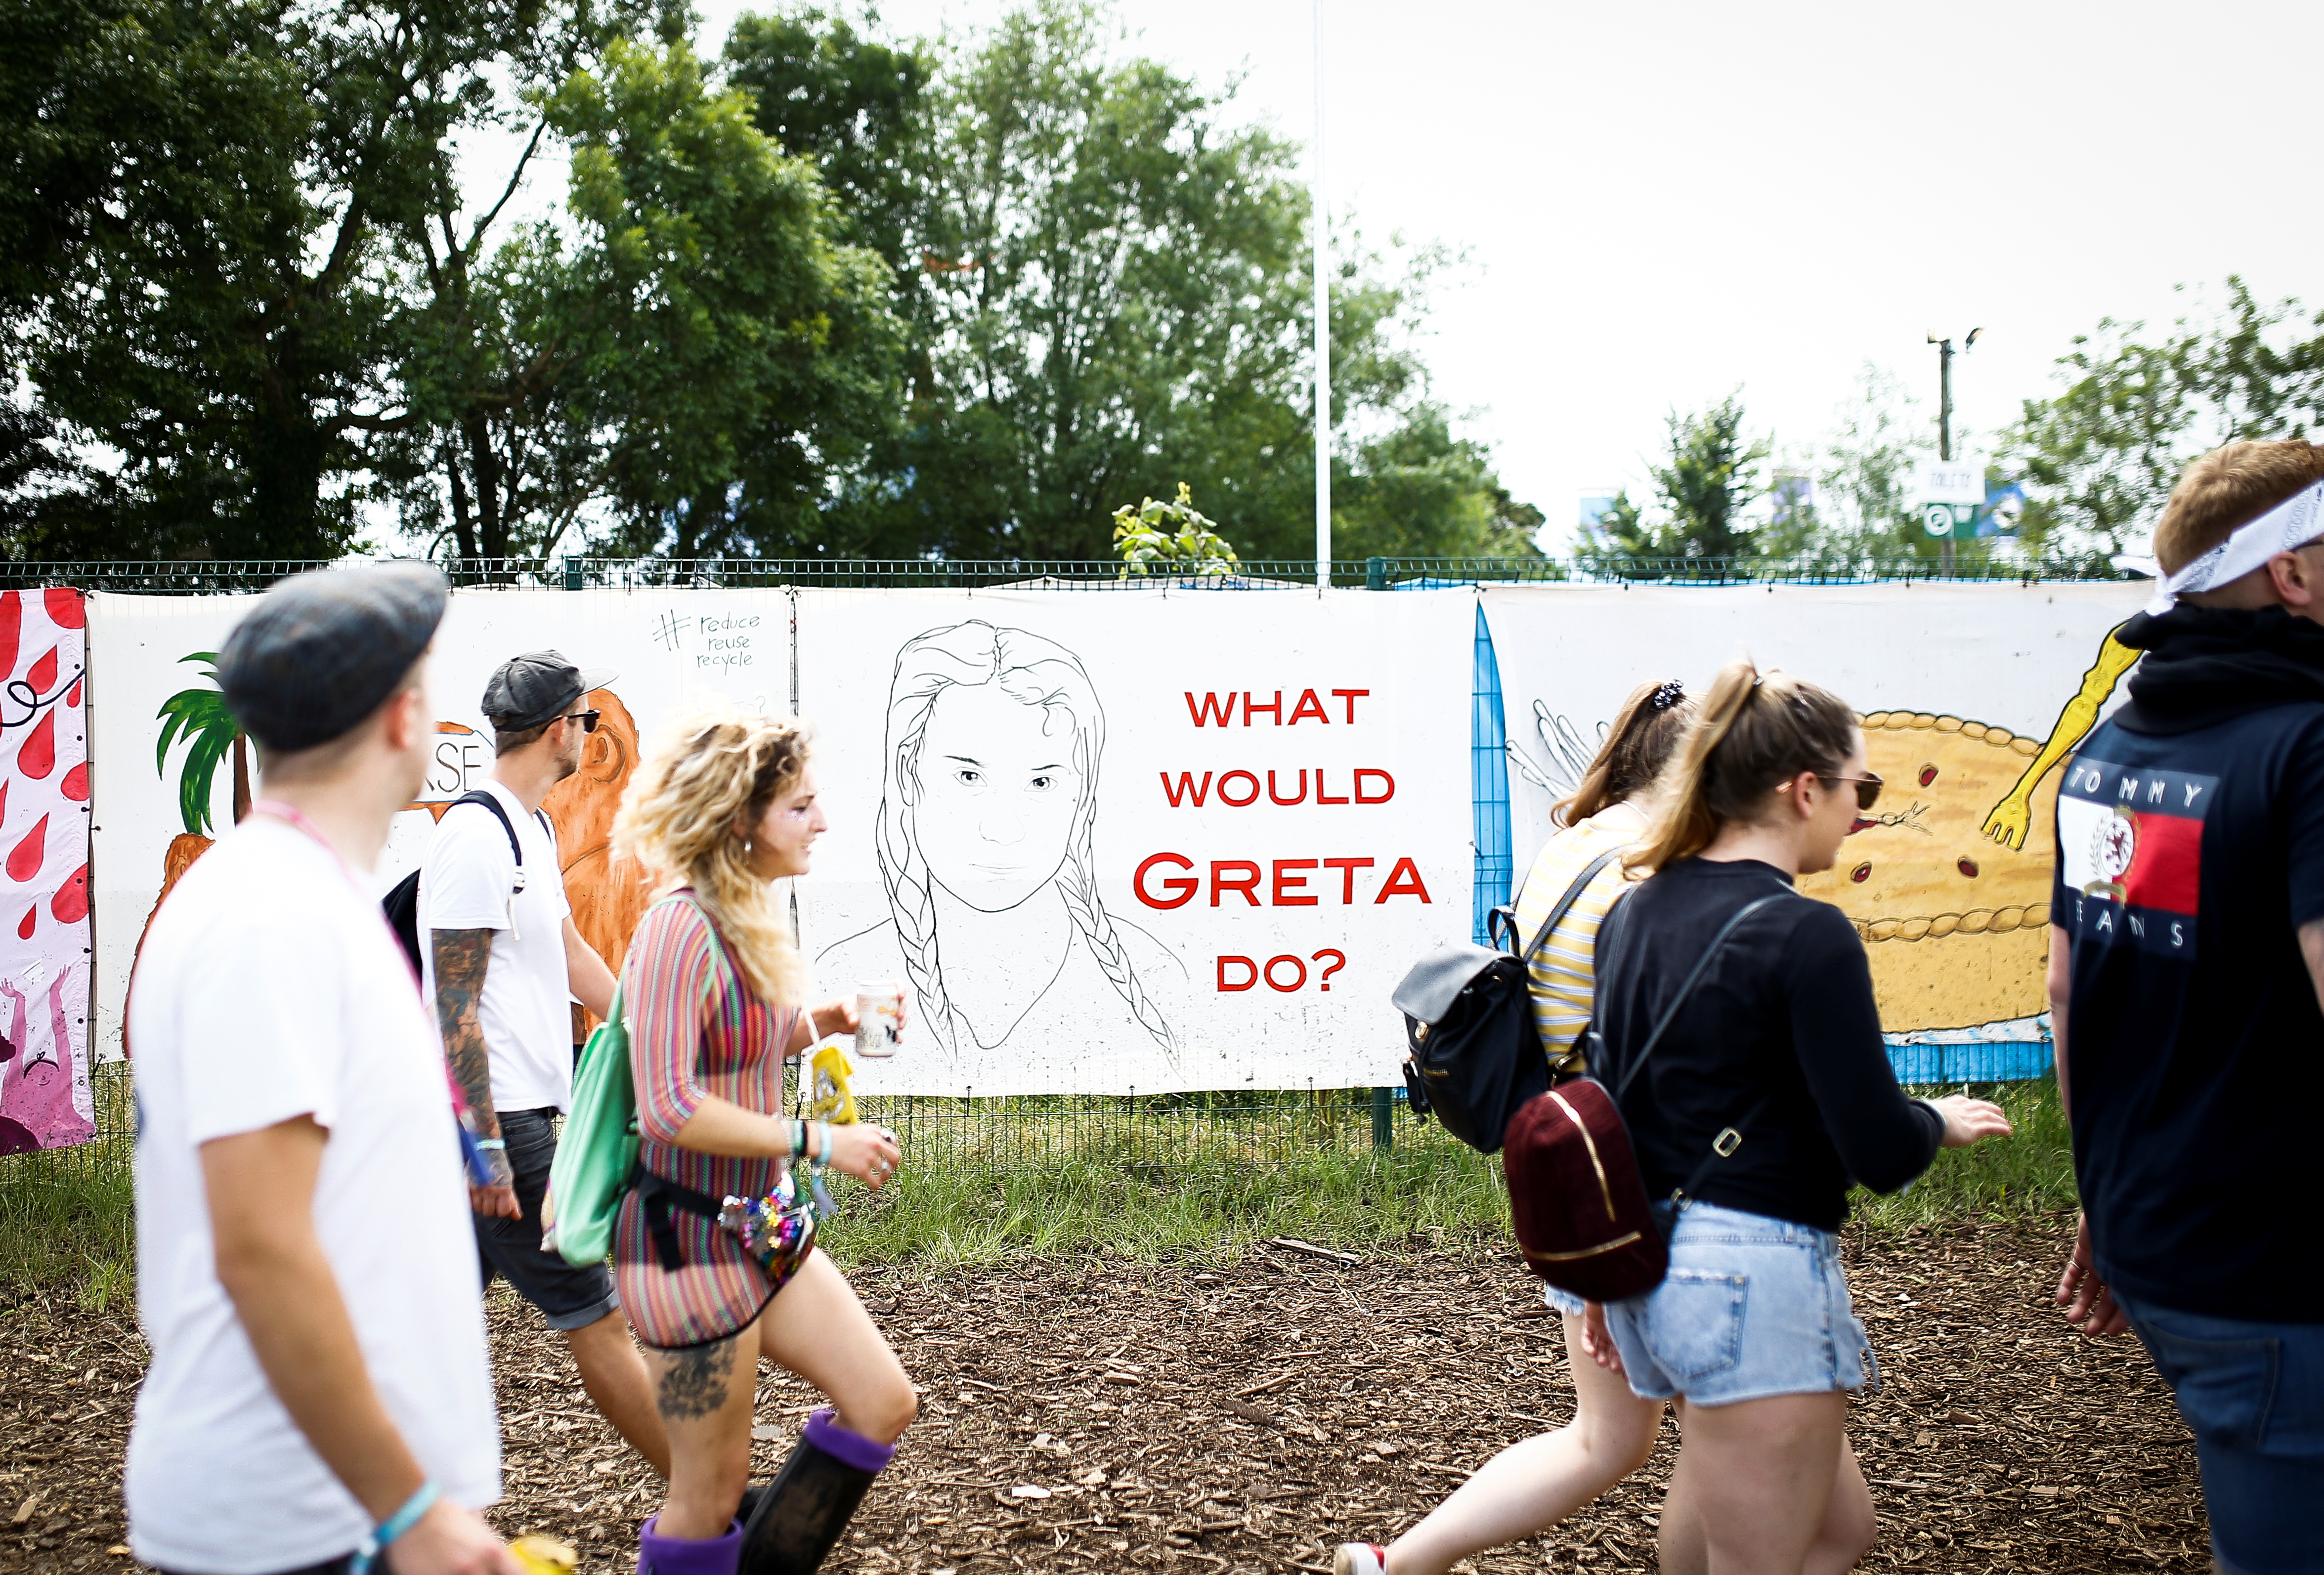 Revellers walk past a Greta Thunberg mural at Glastonbury Festival at Worthy farm in Somerset, Britain June 26, 2019. REUTERS/Henry Nicholls